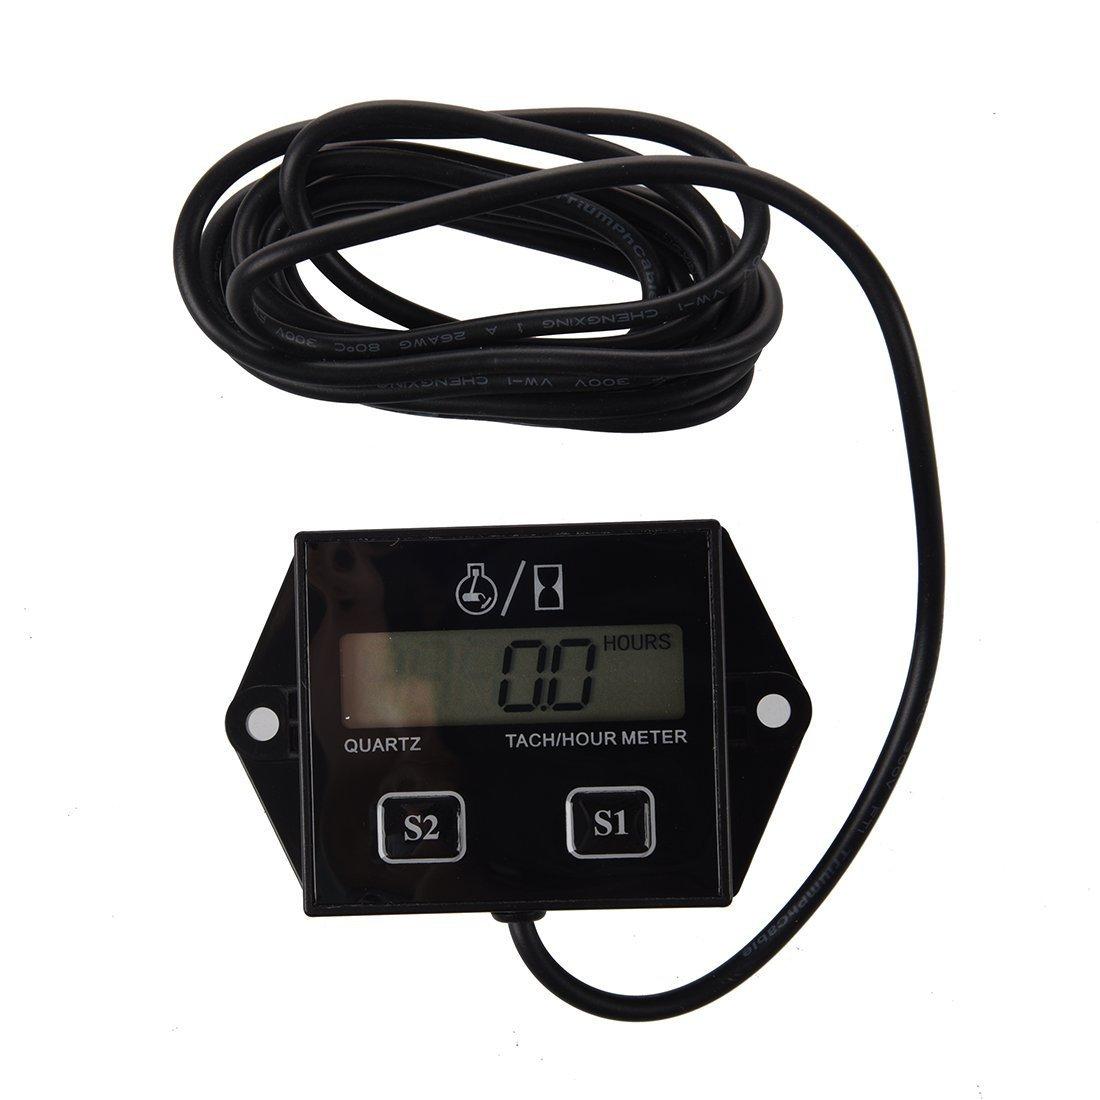 SODIAL(R) Spark Plugs Engine Digital Tach Hour Meter Tachometer Gauge Motorcycle ATV 012492